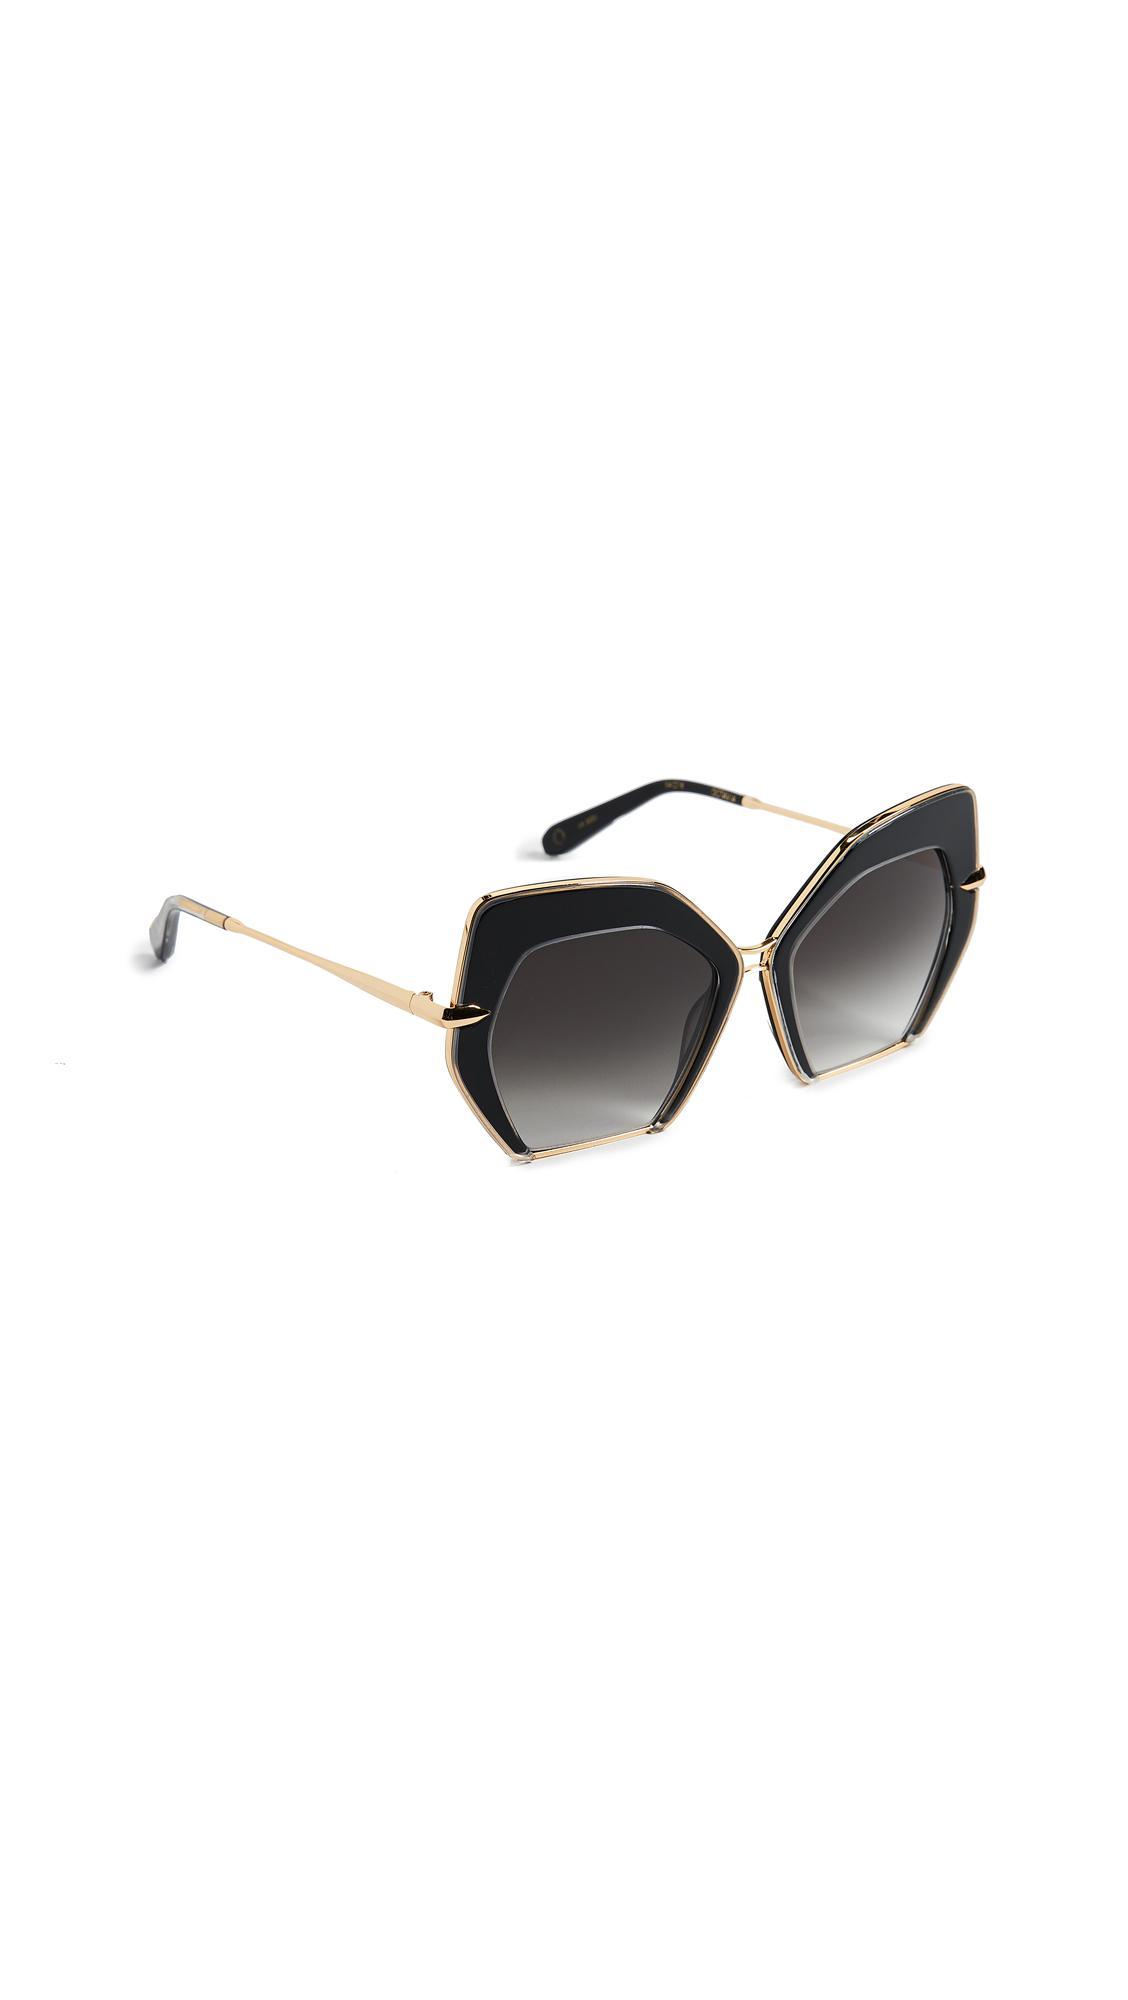 4e91ce8bb3 Krewe Octavia Glam Sunglasses - Lyst